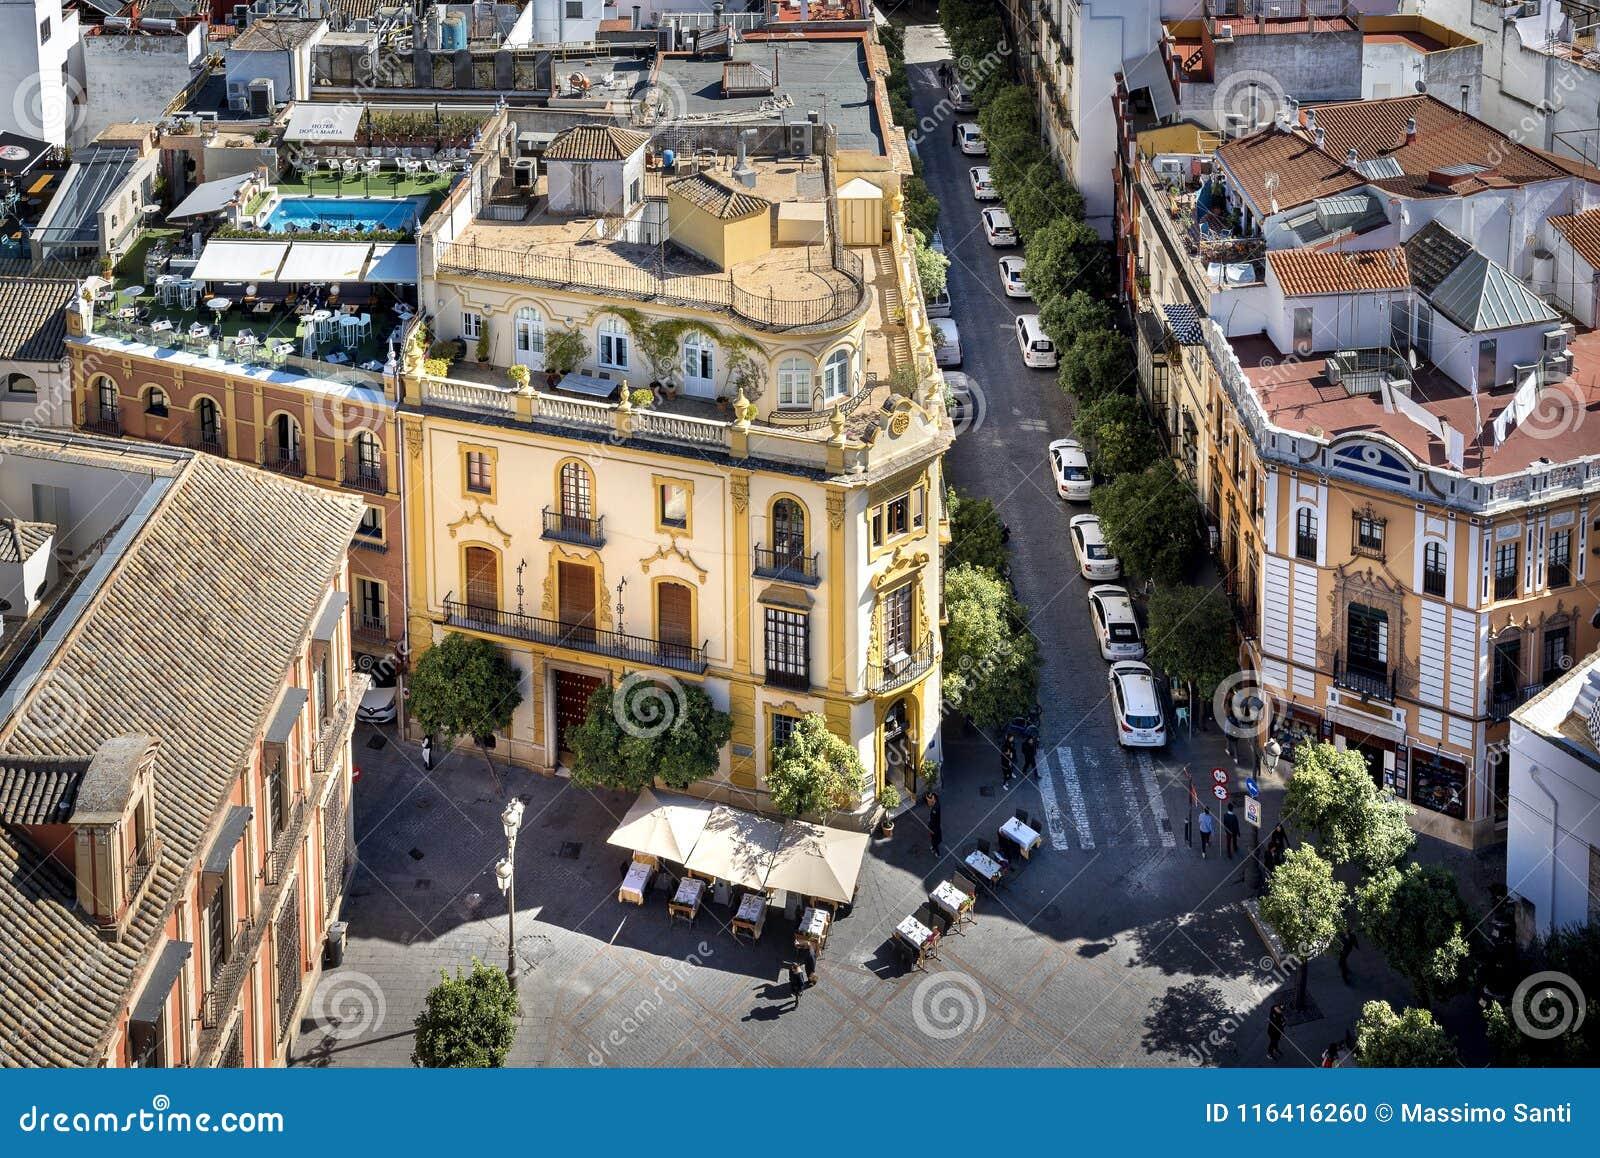 Siviglia - vue de Plaza Virgen de los Reyes du haut de la tour de Giralda l espagne